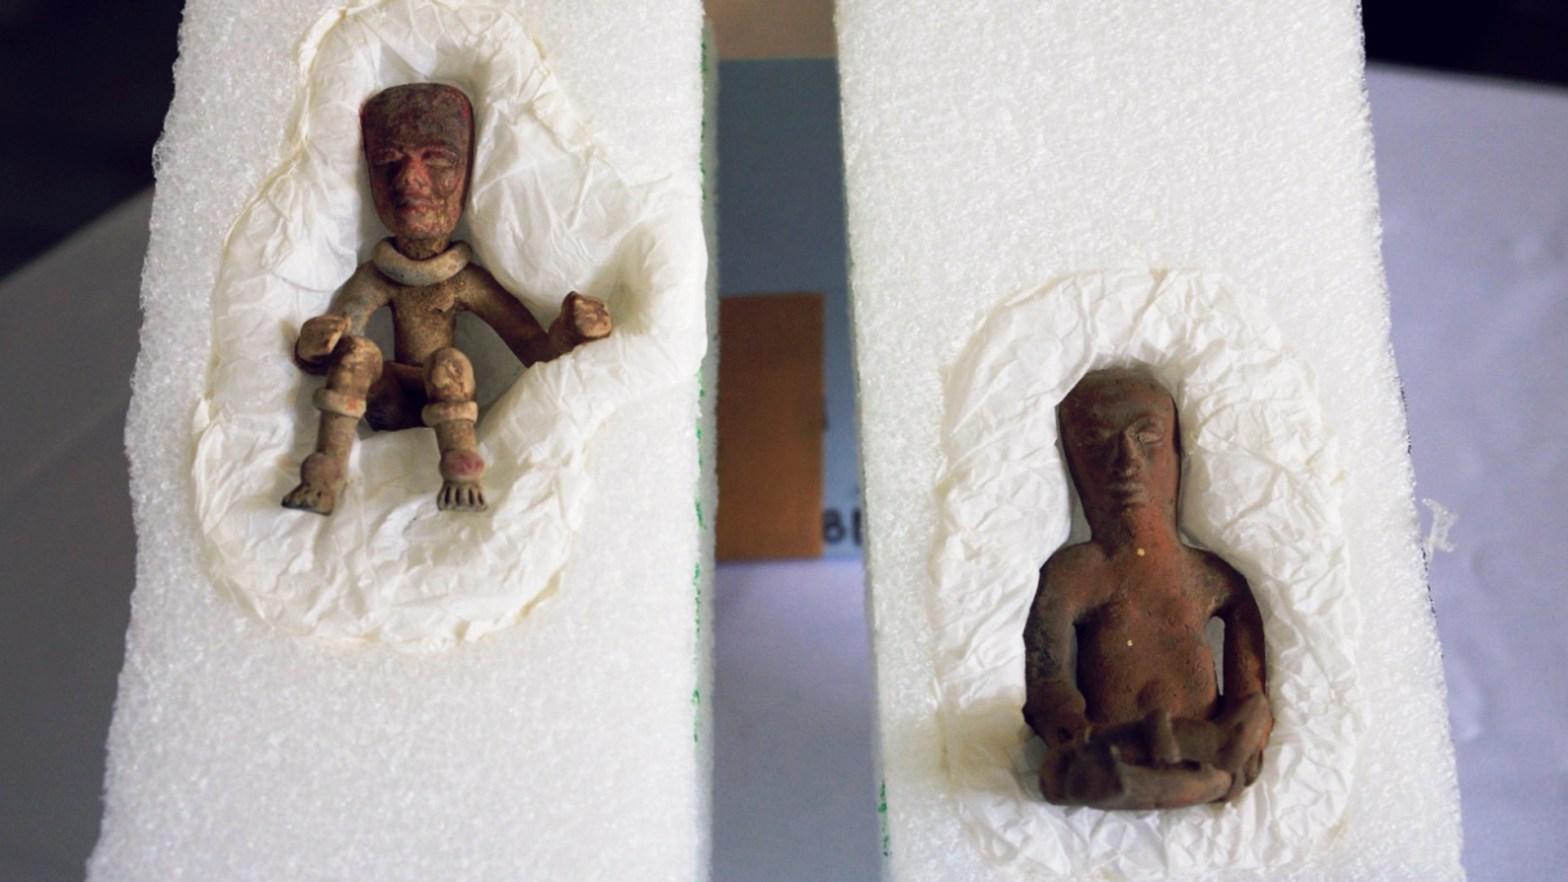 Denuncian a Gerhard Hirsch Nachfolger por subastar piezas arqueológicas